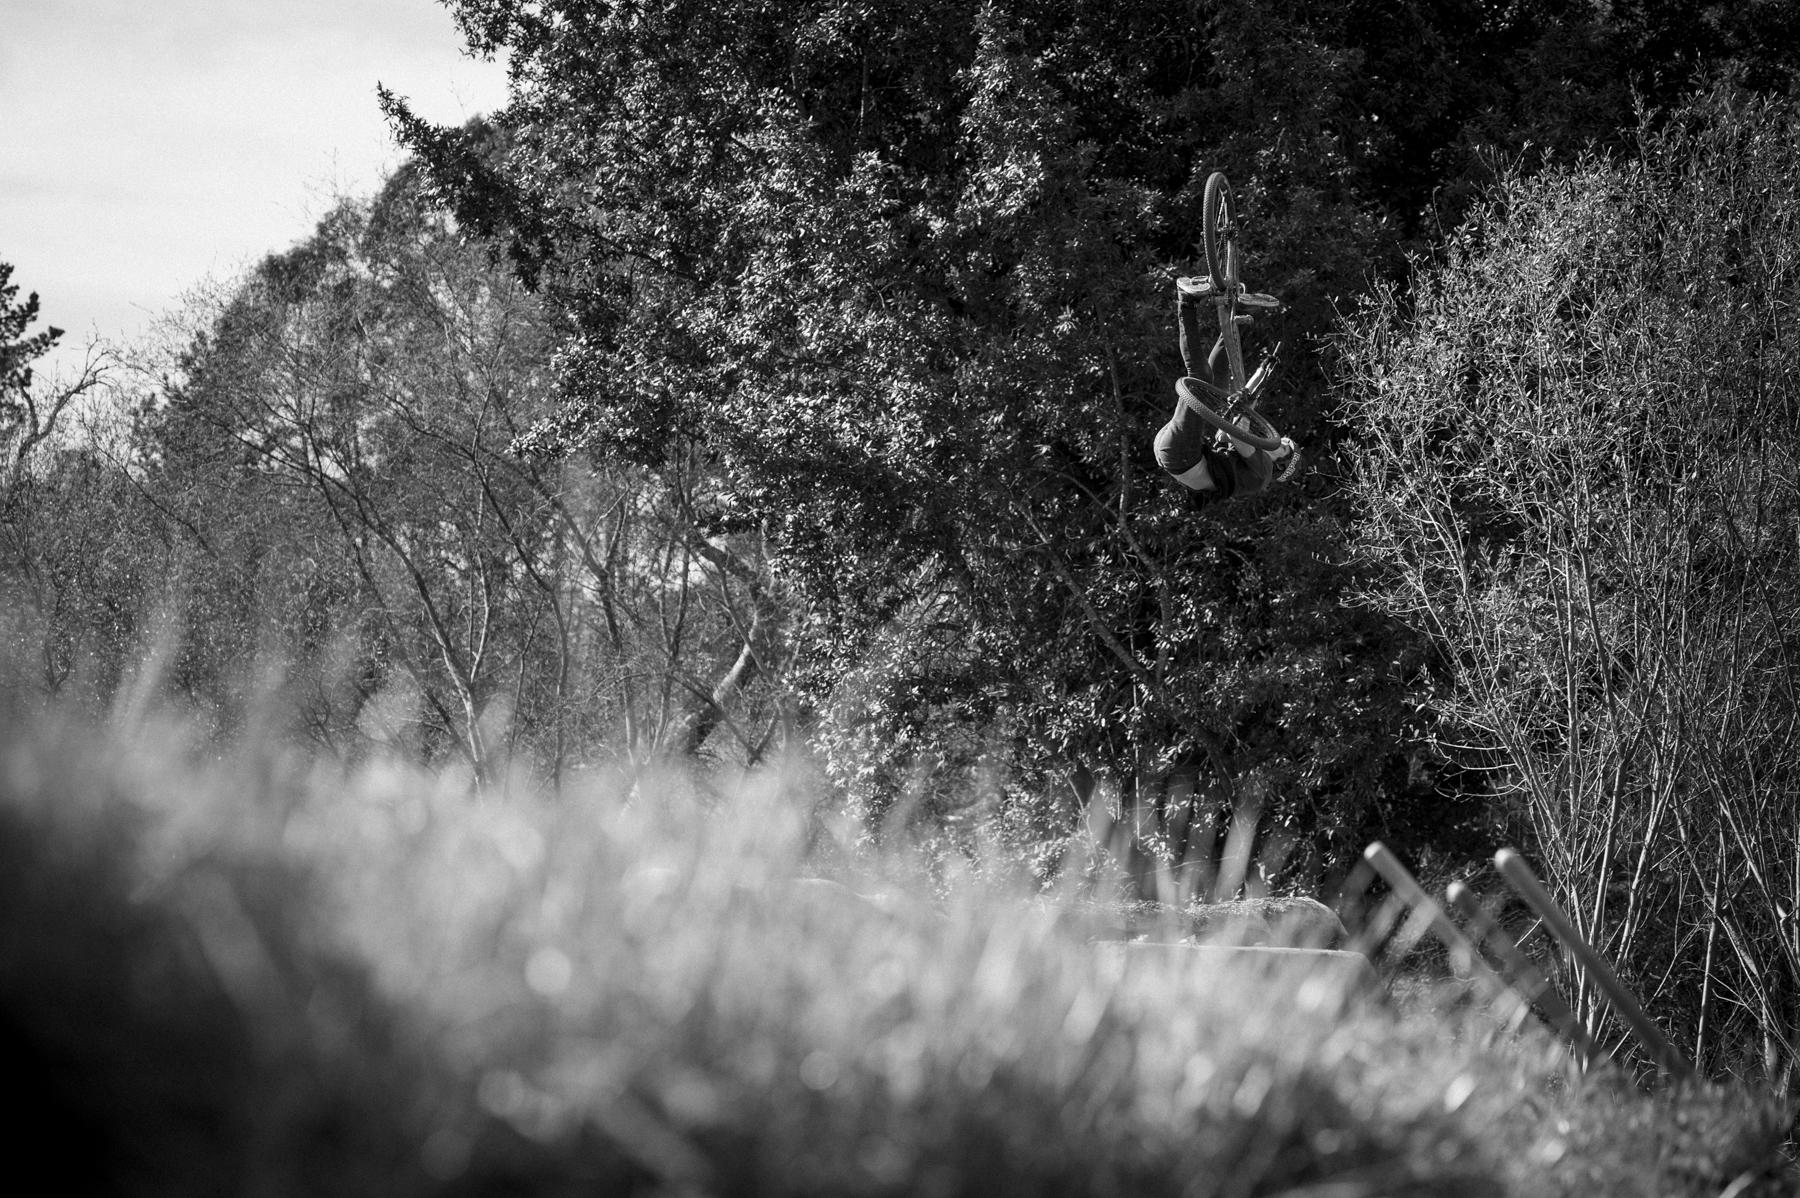 Slopestyle Prep at Deer Camp.  Soquel, California 2015